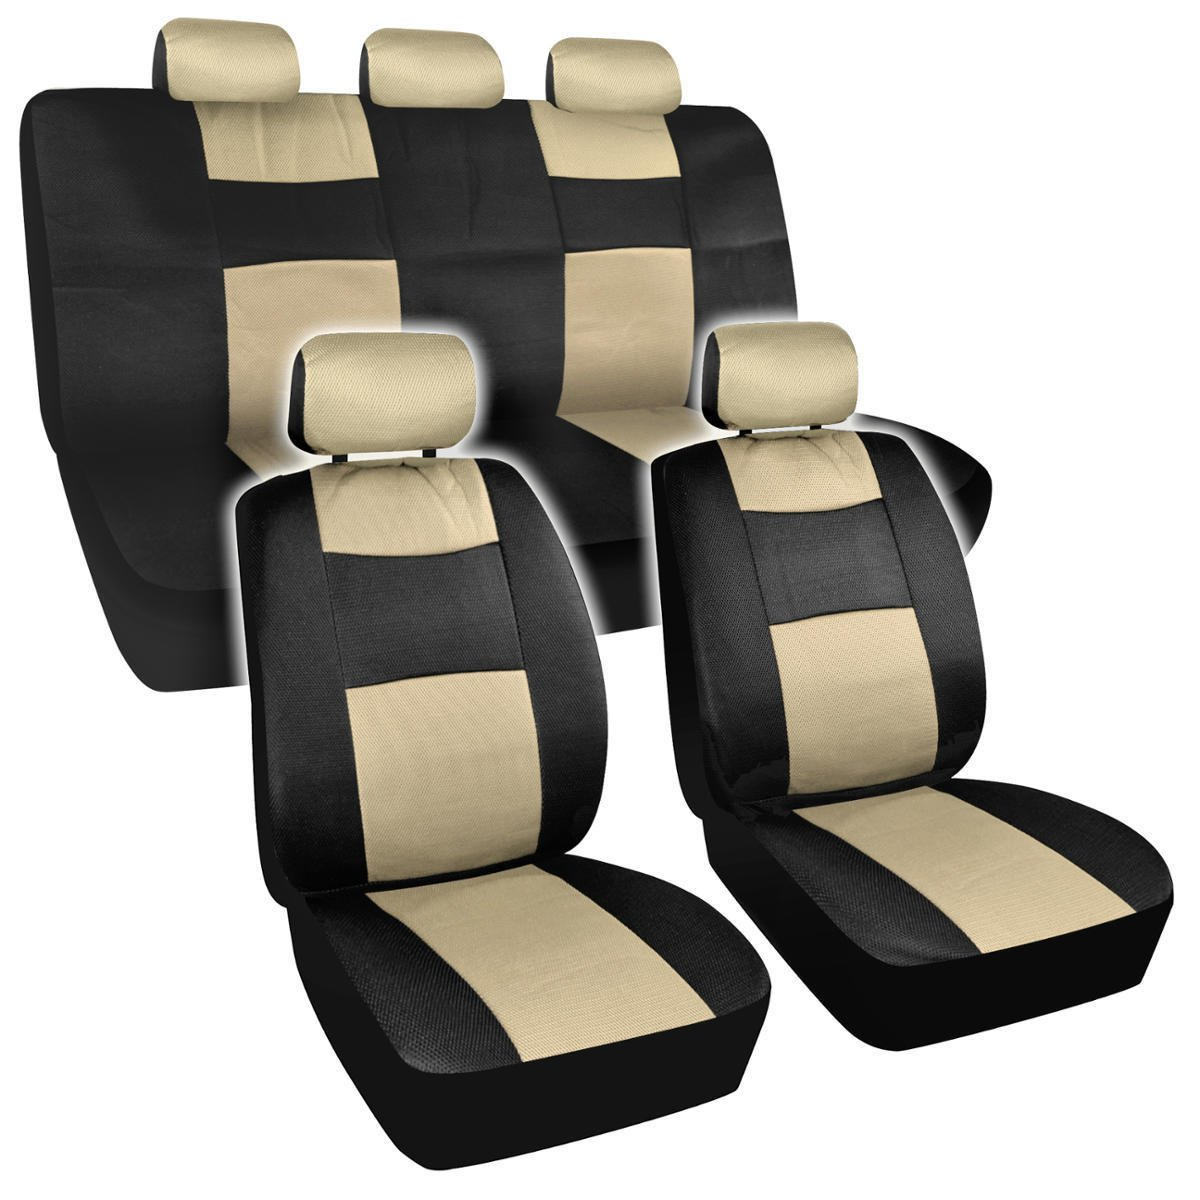 Full Interior Car Seat Covers Black Beige Supreme Padding Mesh Netting Comfort